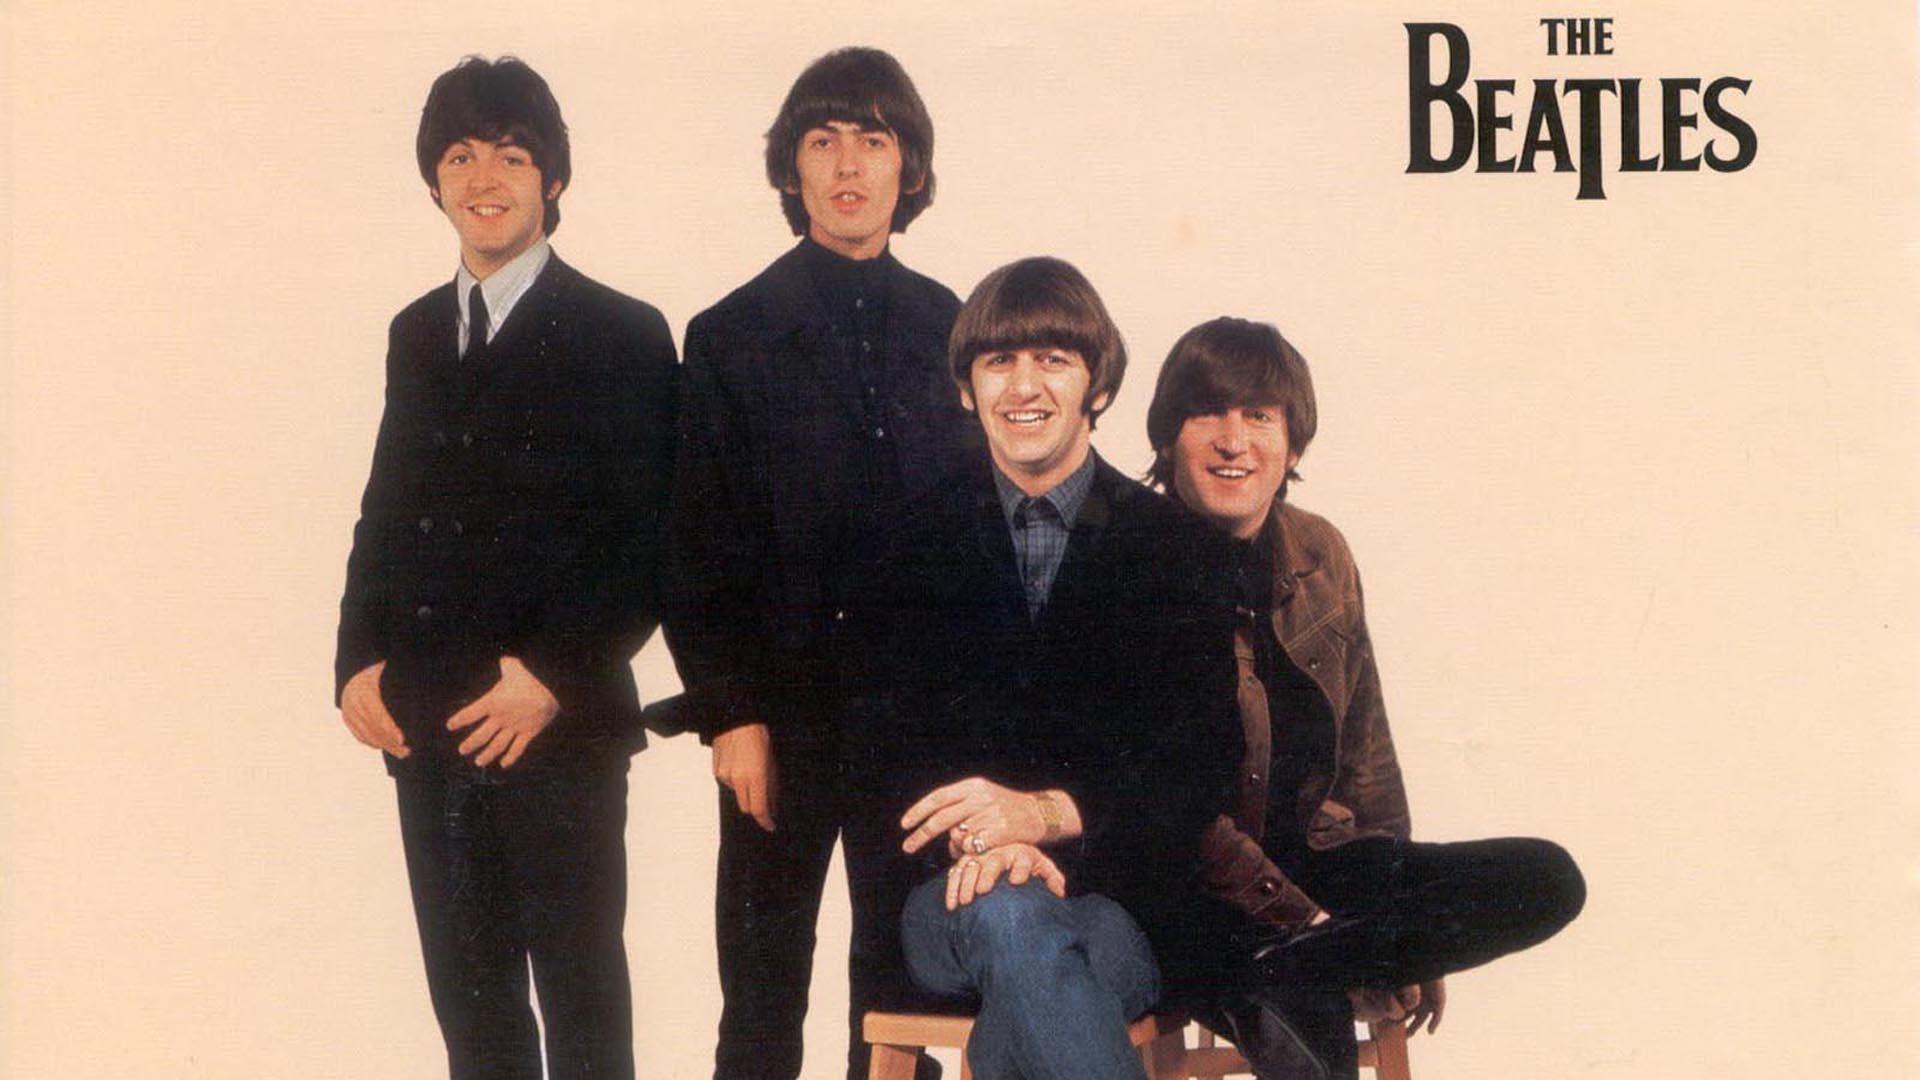 Peachy Beatles Beatles wallpaper, Beatles wallpaper